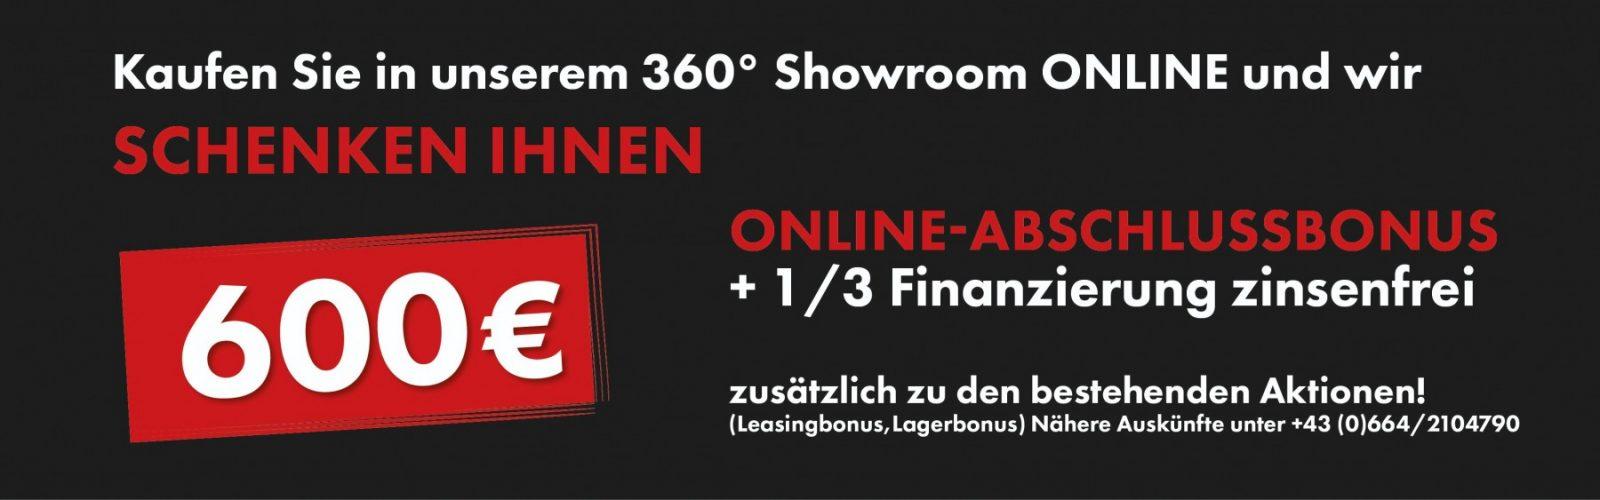 600 Onlinebonus bei Ing. Günther Baschinger GmbH in